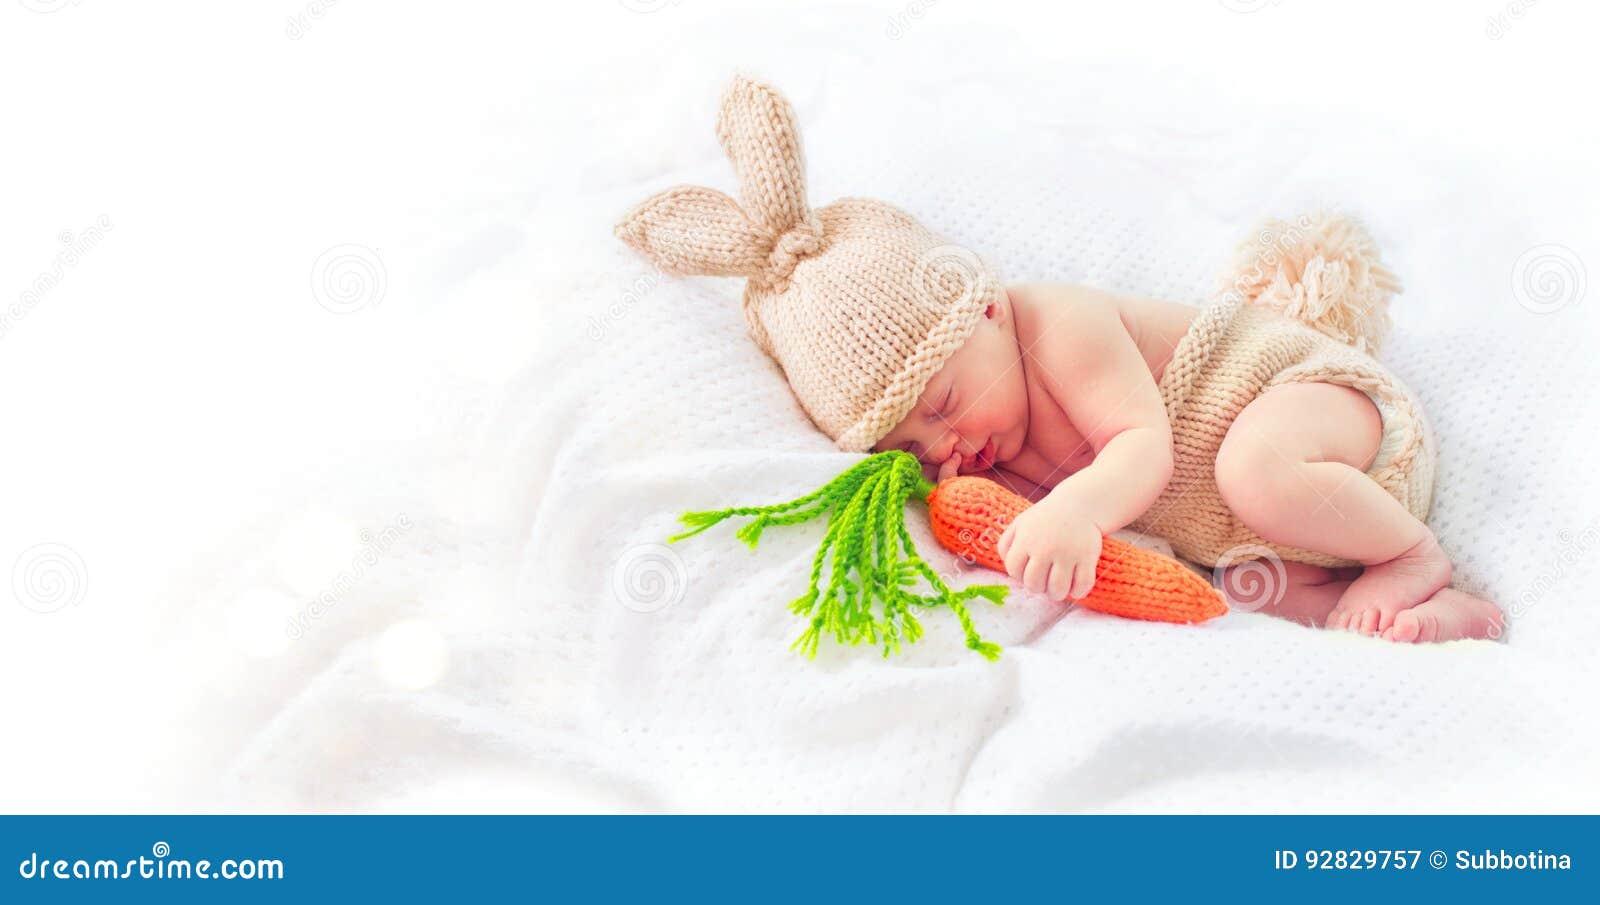 Cute Newborn Baby Boy Wearing Knitted Bunny Costume Stock Image